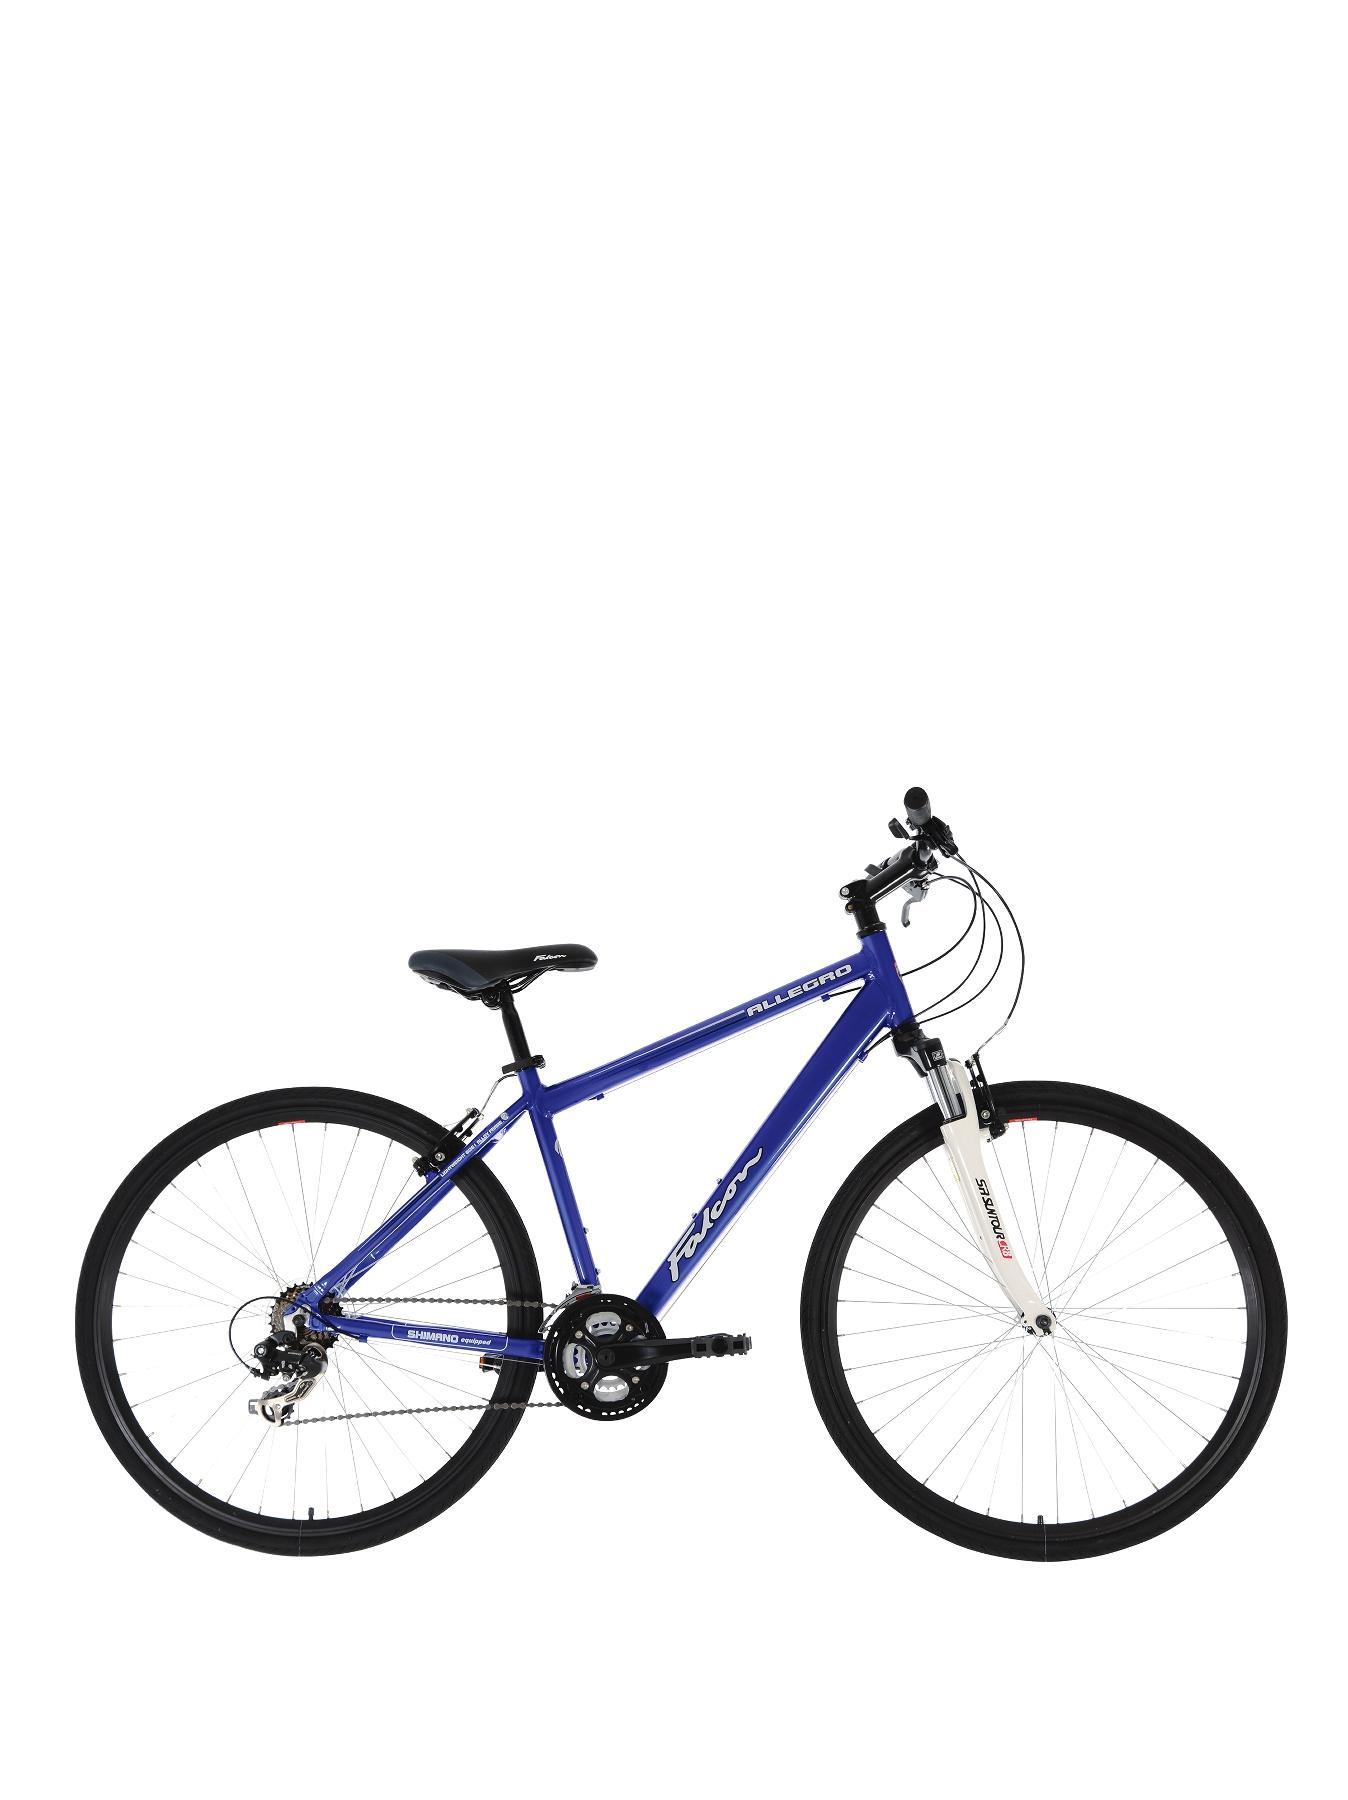 Allegro 700C Mens Bike